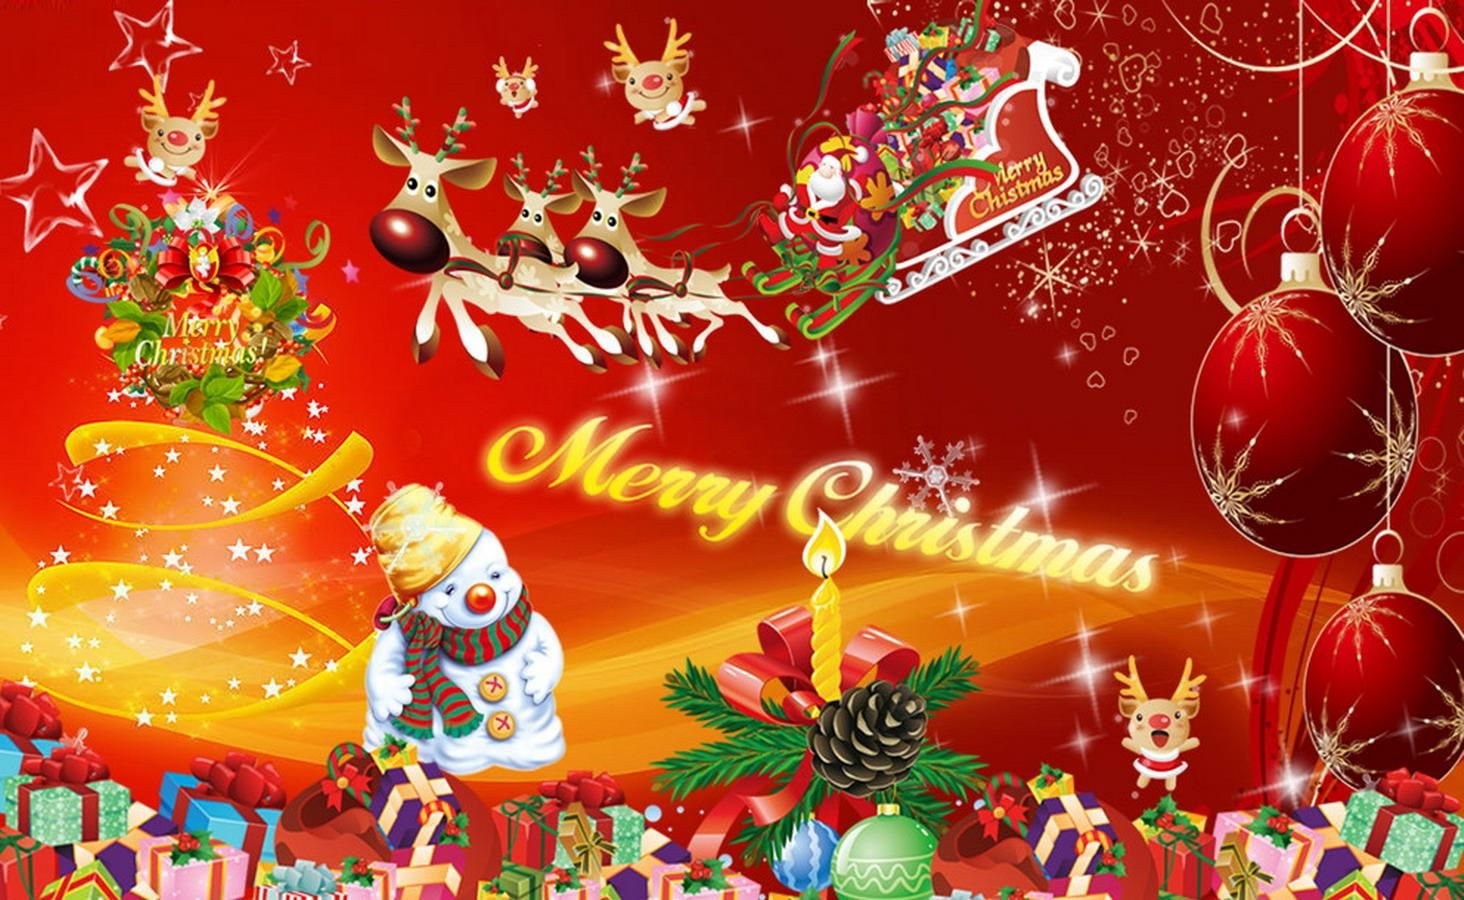 Merrychristmas Christmascards Christmasgreetings Happychristmas Christmasimages Christmas Wallpaper Free Merry Christmas Poems Christmas Wallpaper Hd